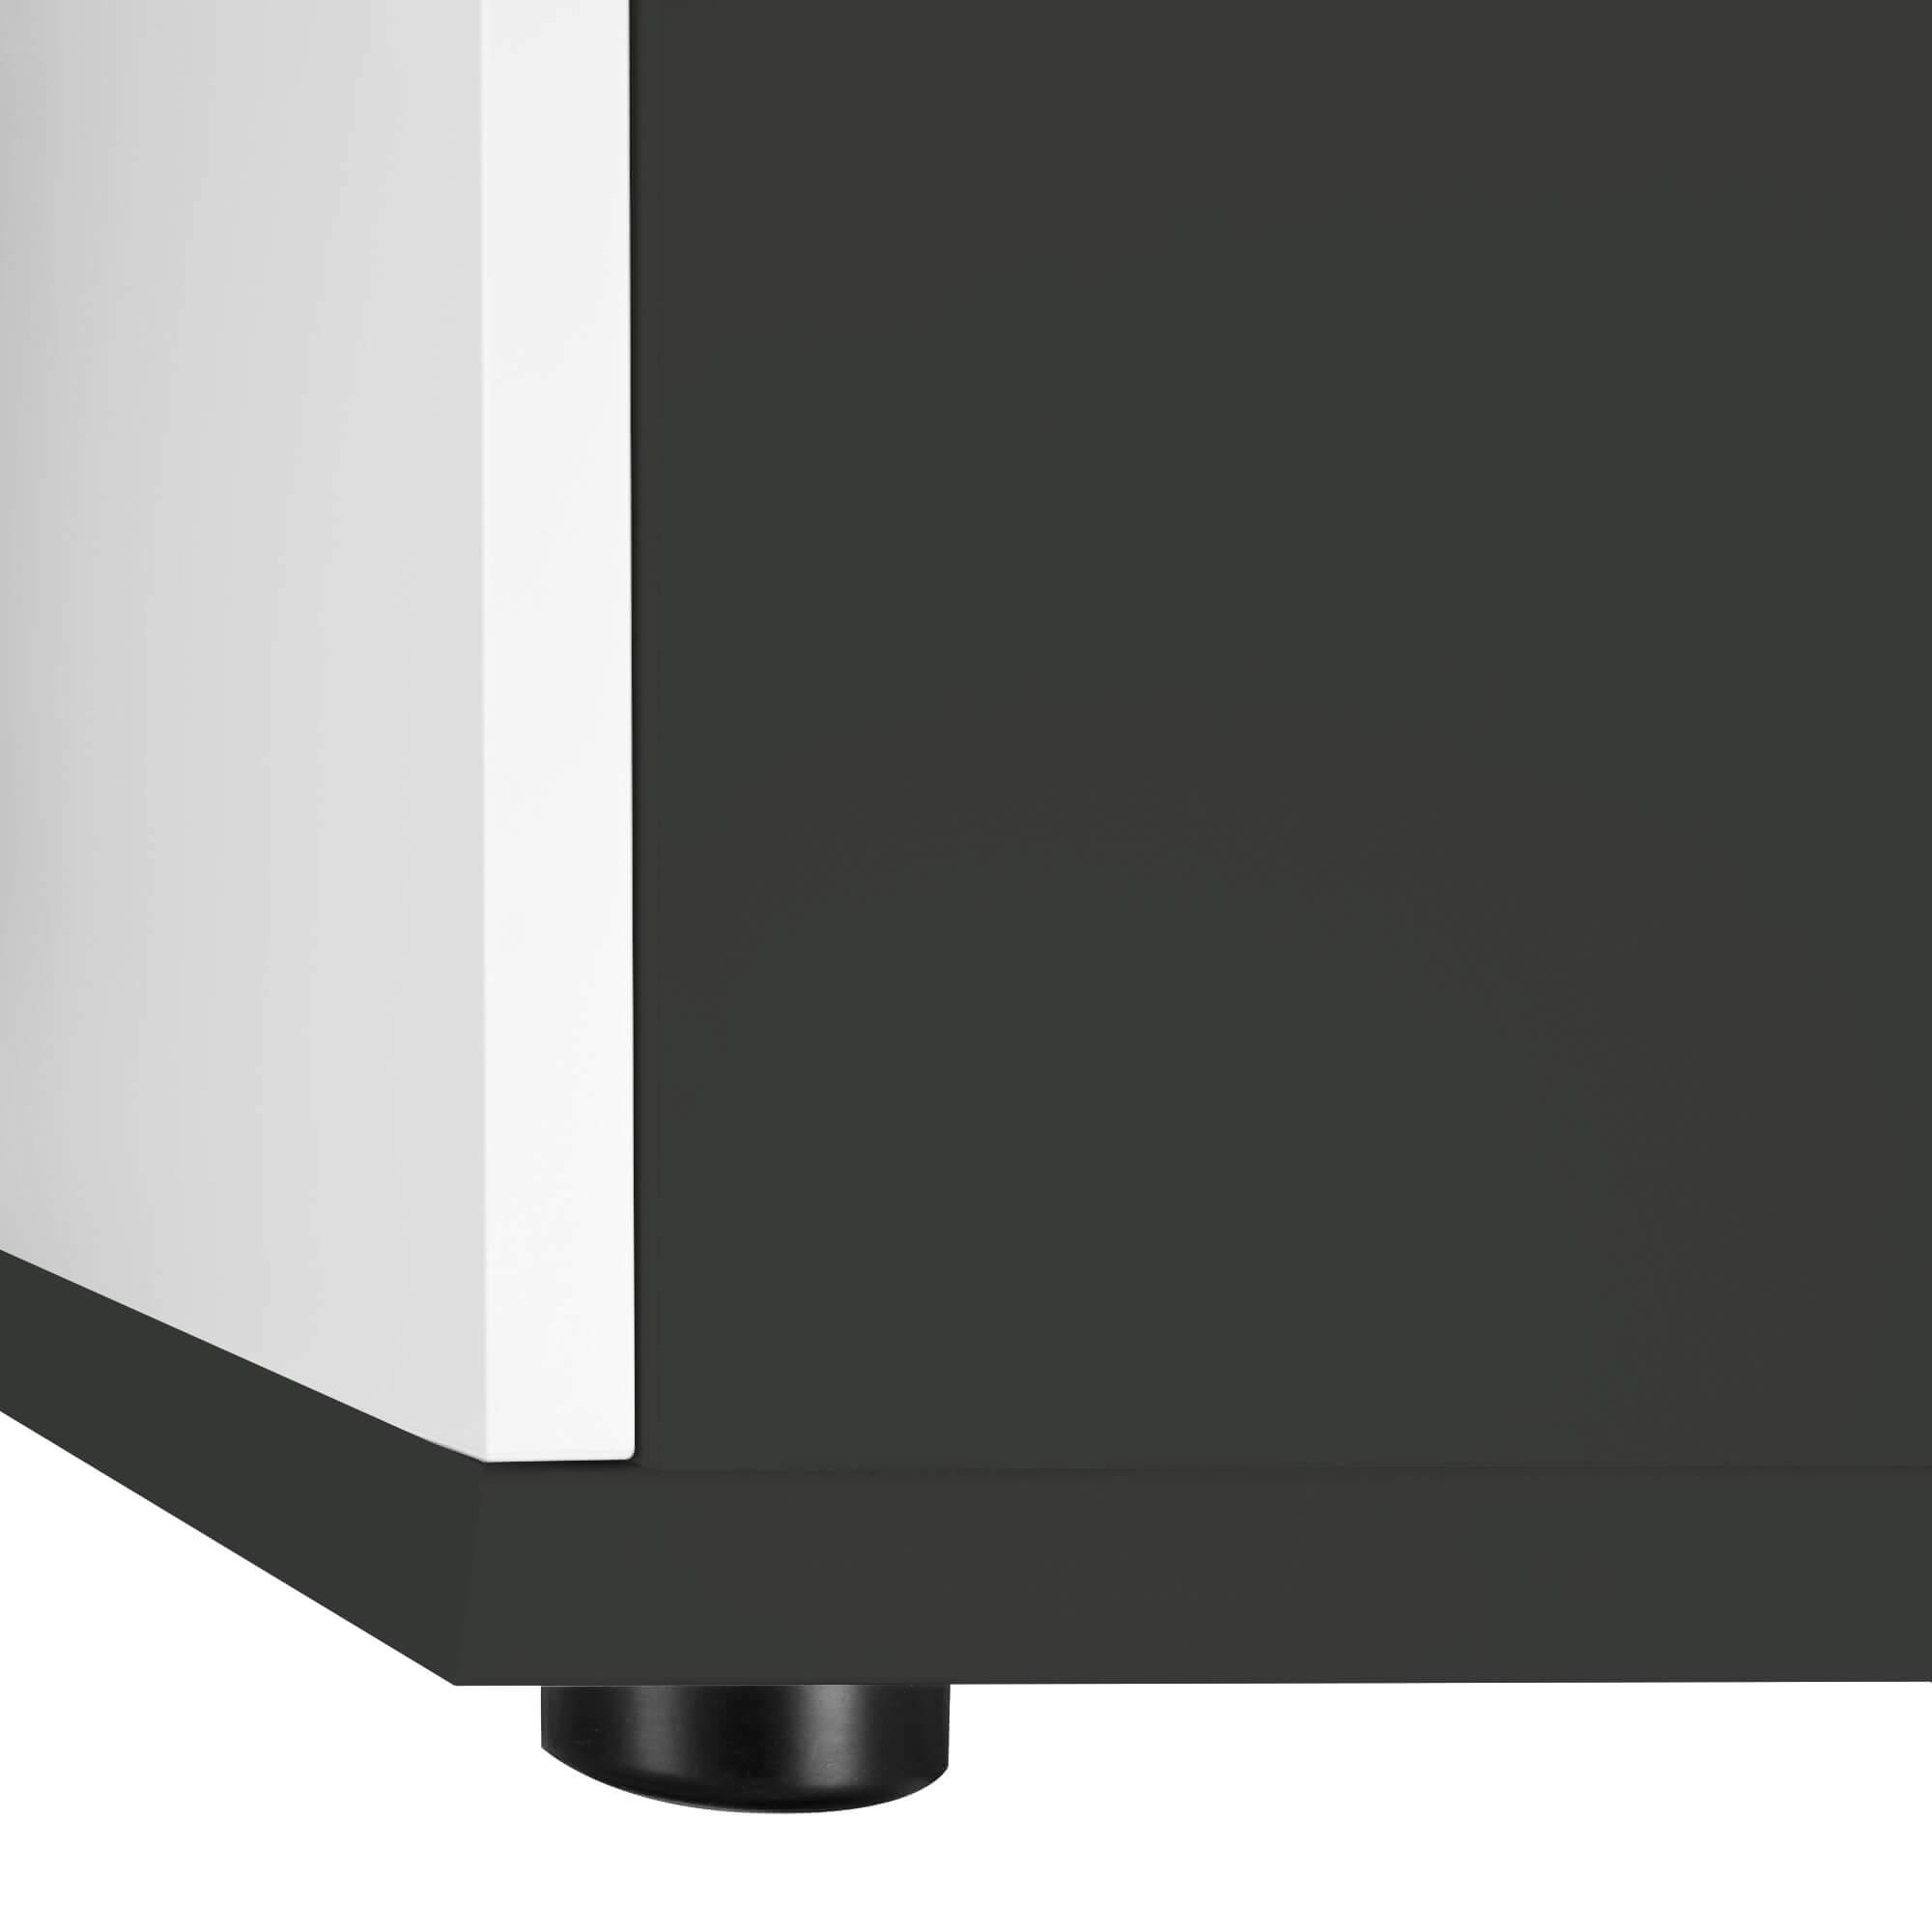 PROFI Aktenschrank abschließbar 3OH Weiß-Anthrazit Schrank Büroschrank Flügeltürenschrank